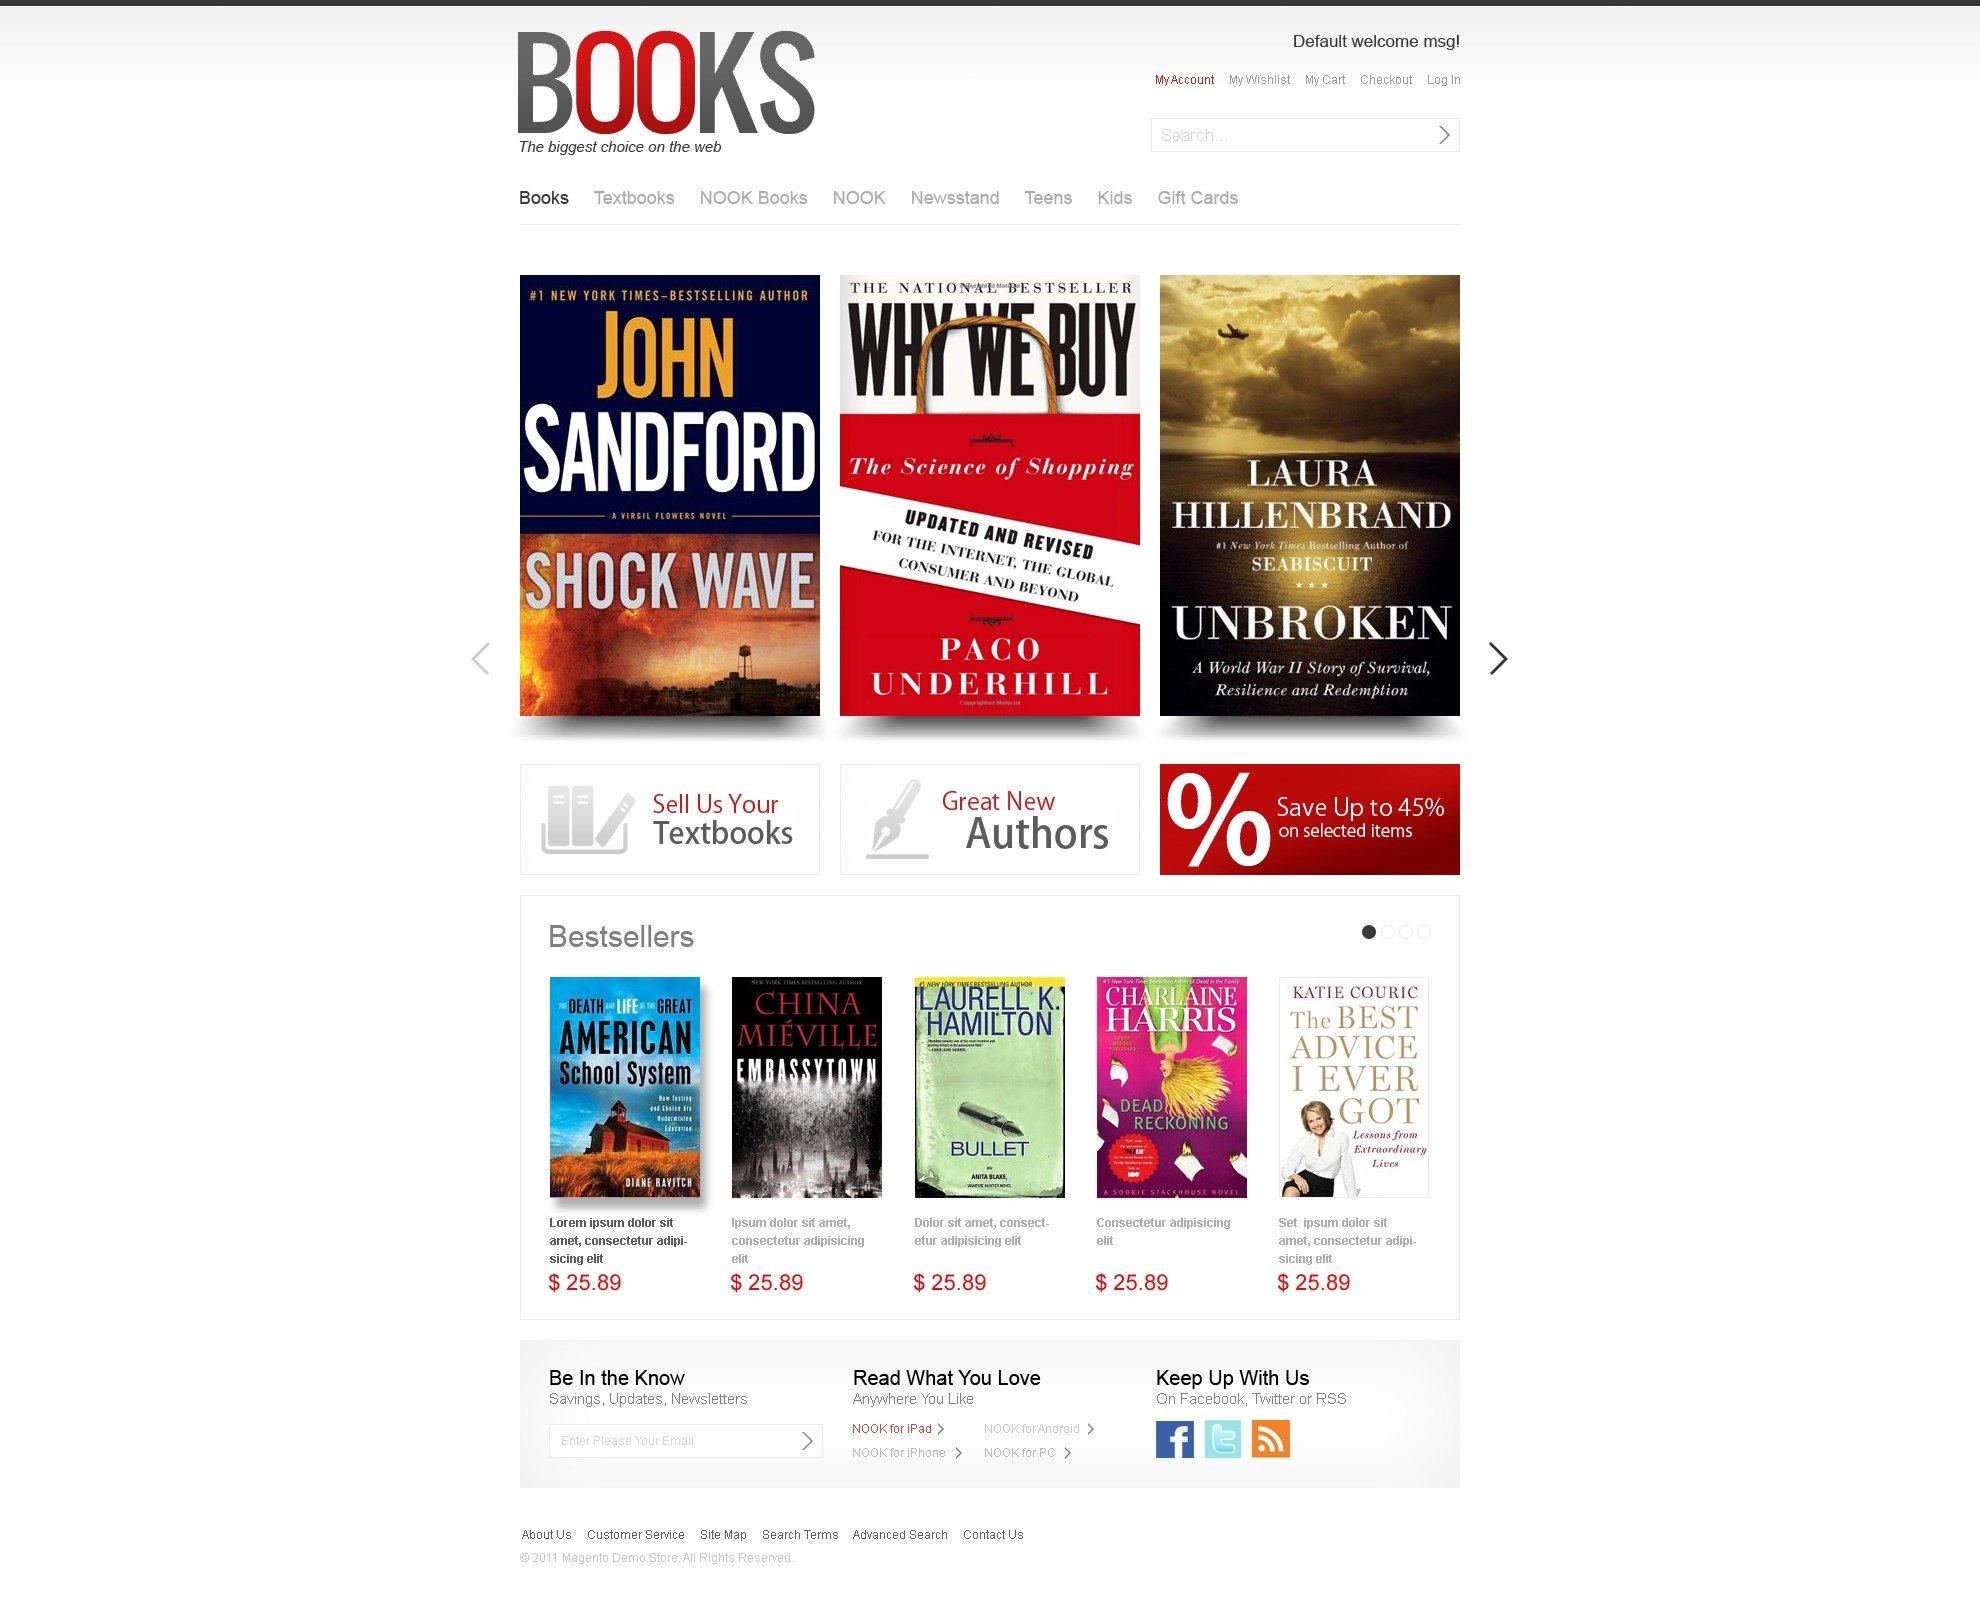 book store facebook flash template 37480. Black Bedroom Furniture Sets. Home Design Ideas